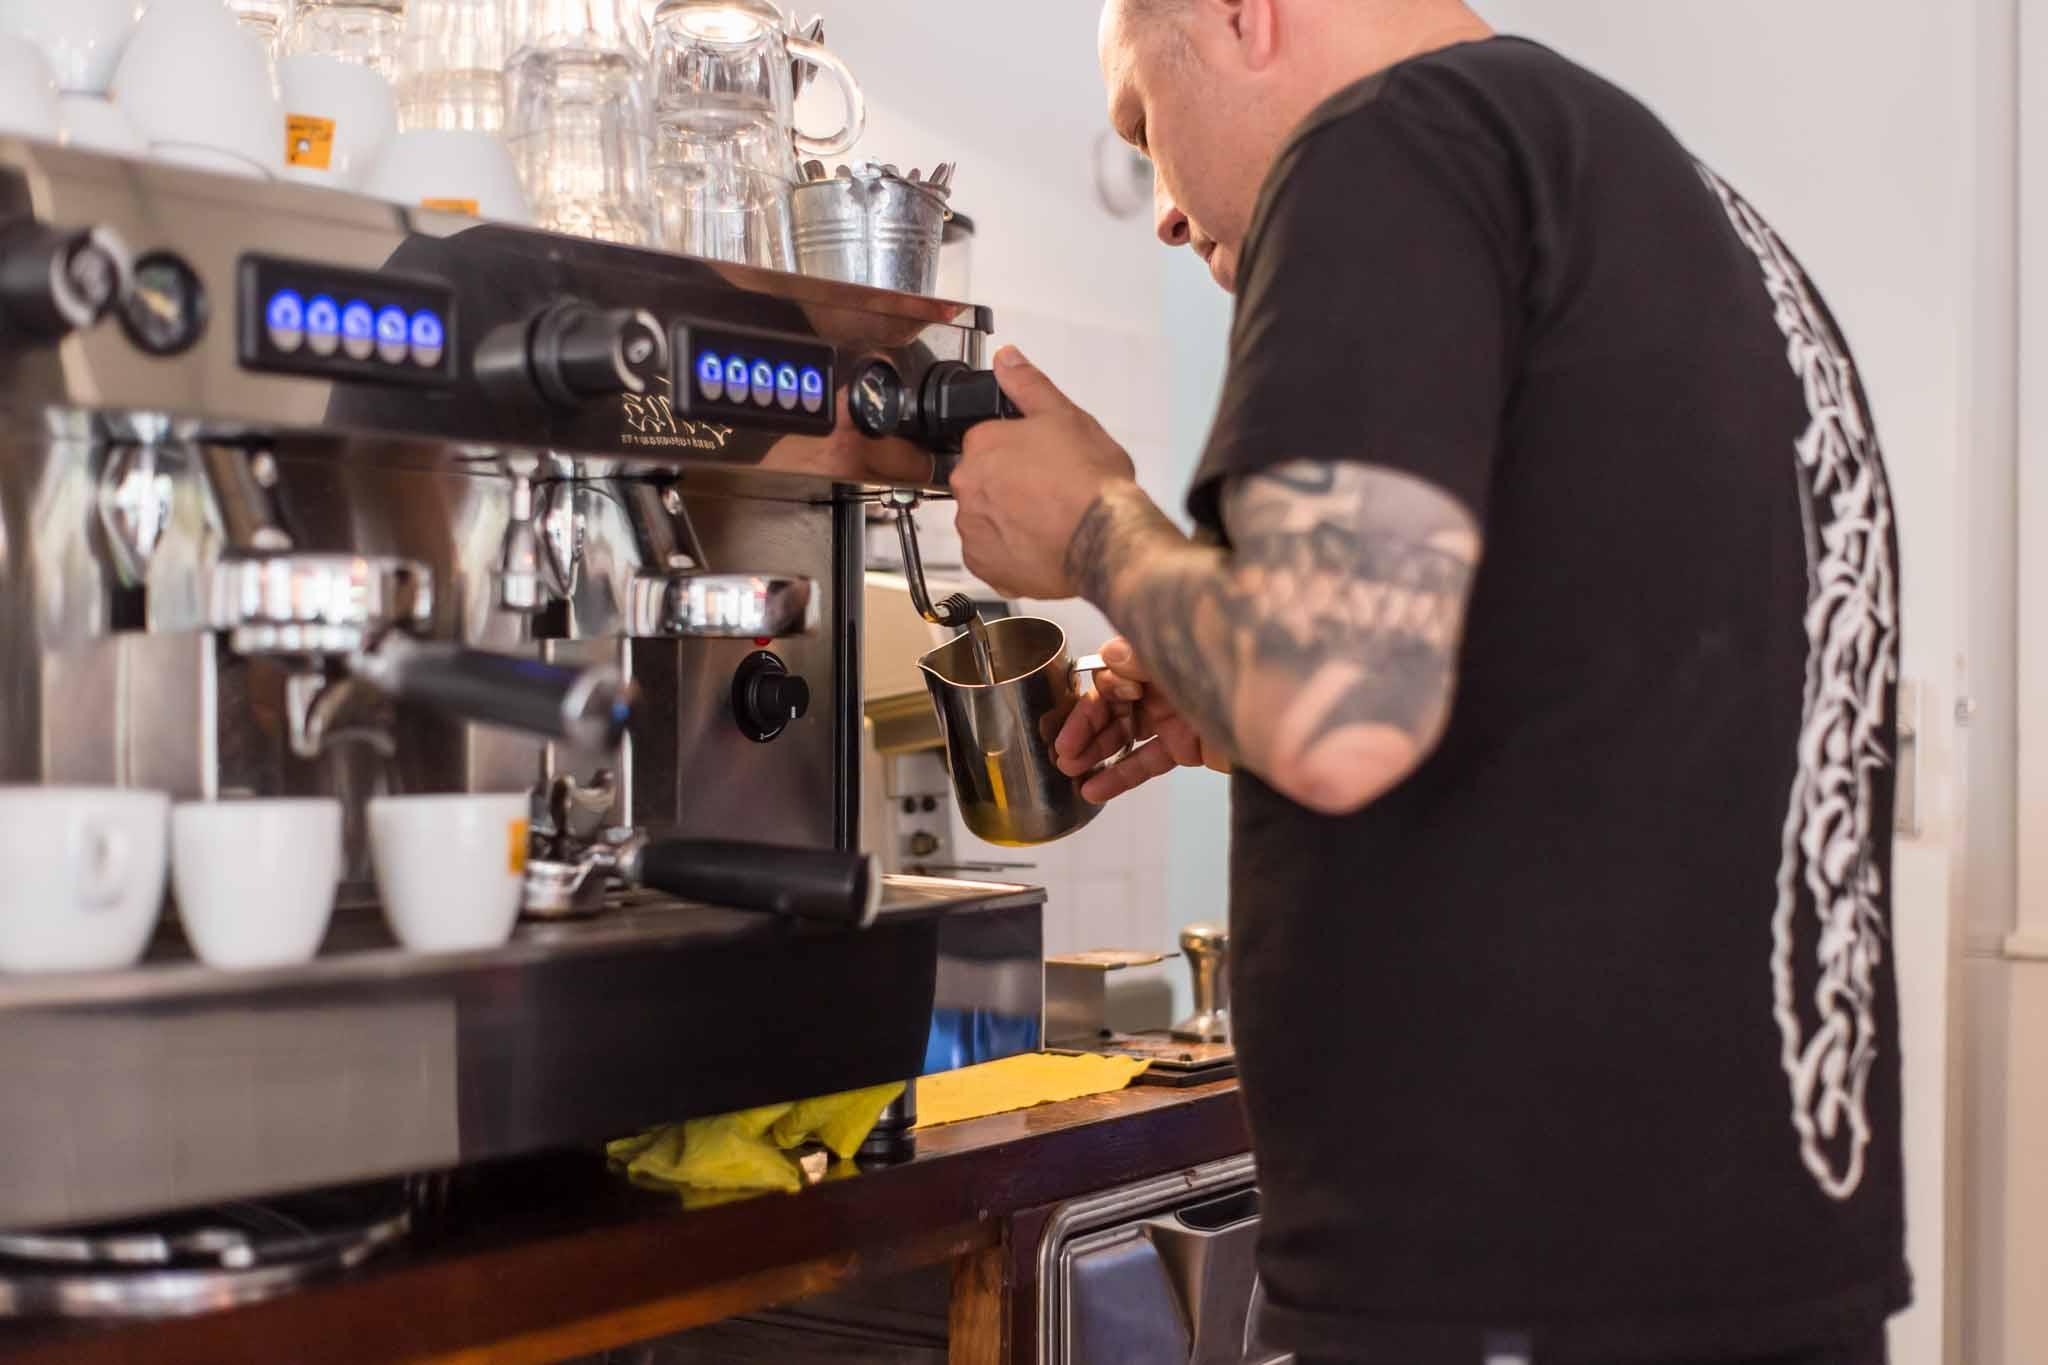 Staff in a cafe preparing coffee on a coffee machine